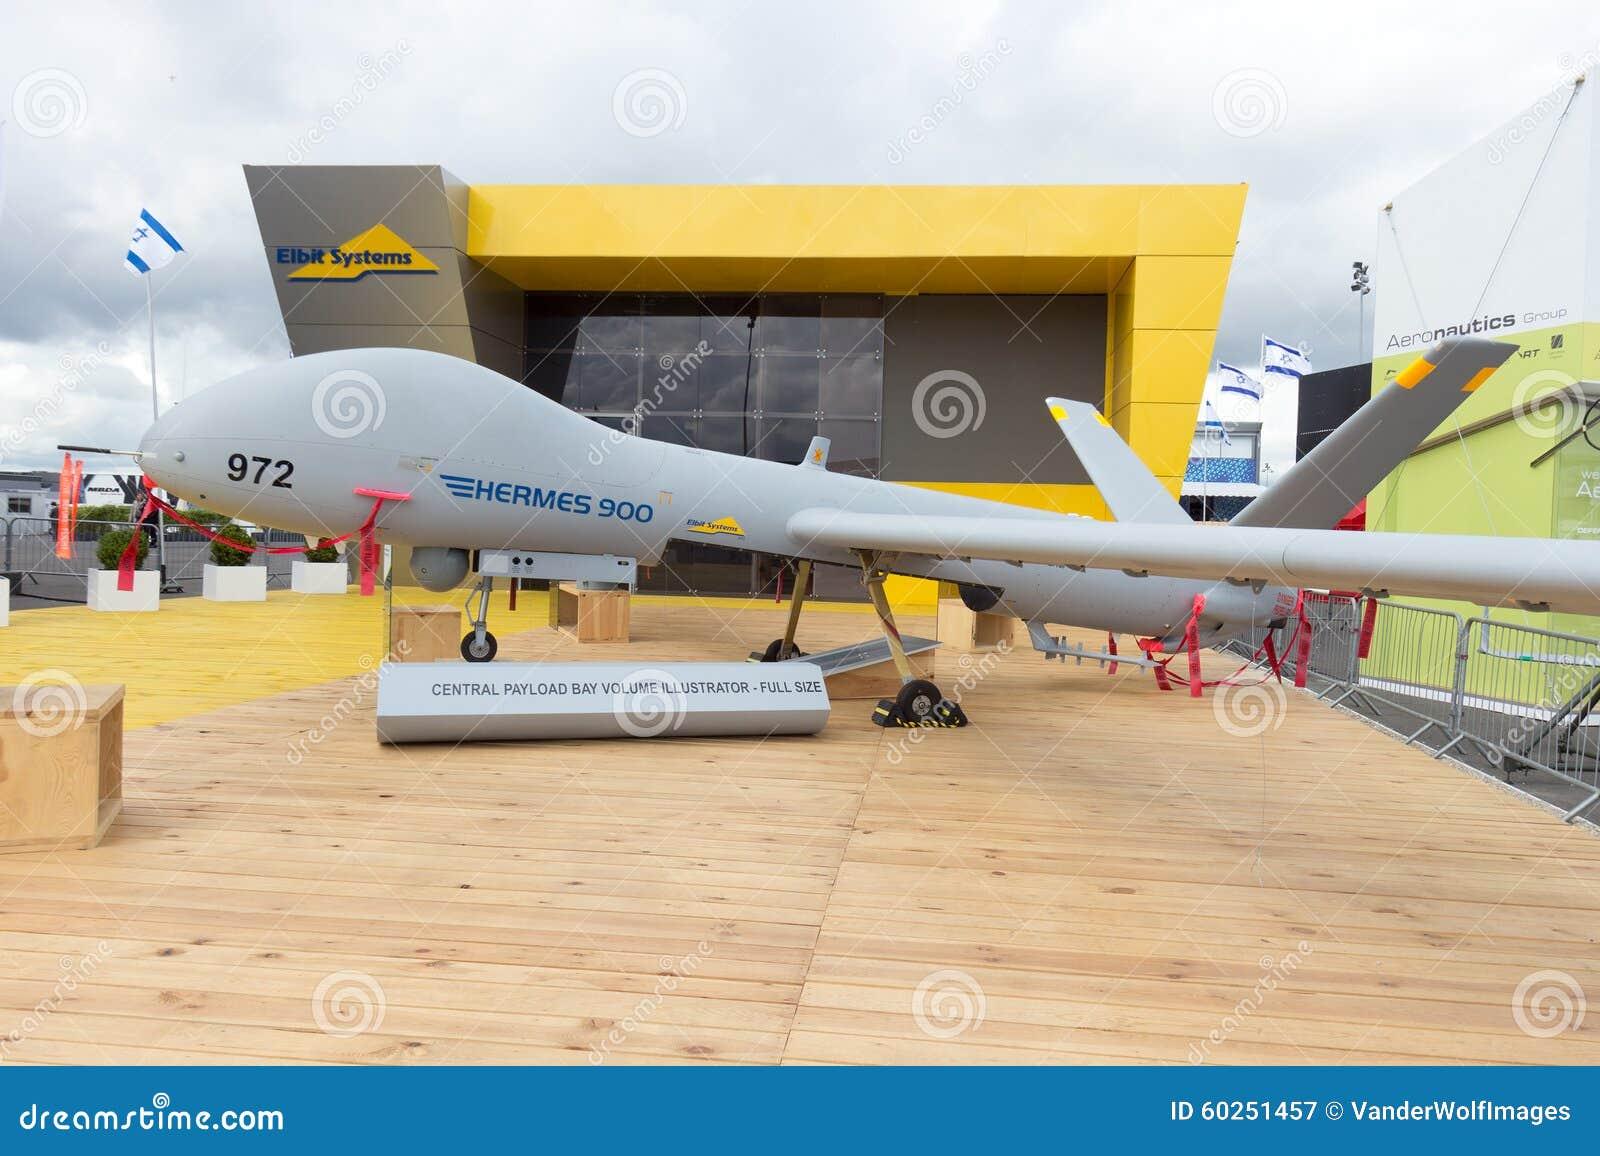 5d9b53f0a077b2 PARIS-LE BOURGET - JUN 18, 2015  Elbit Systems Hermes 900 unmanned aerial  vehicle (UAV) at the 51st International Paris Air show